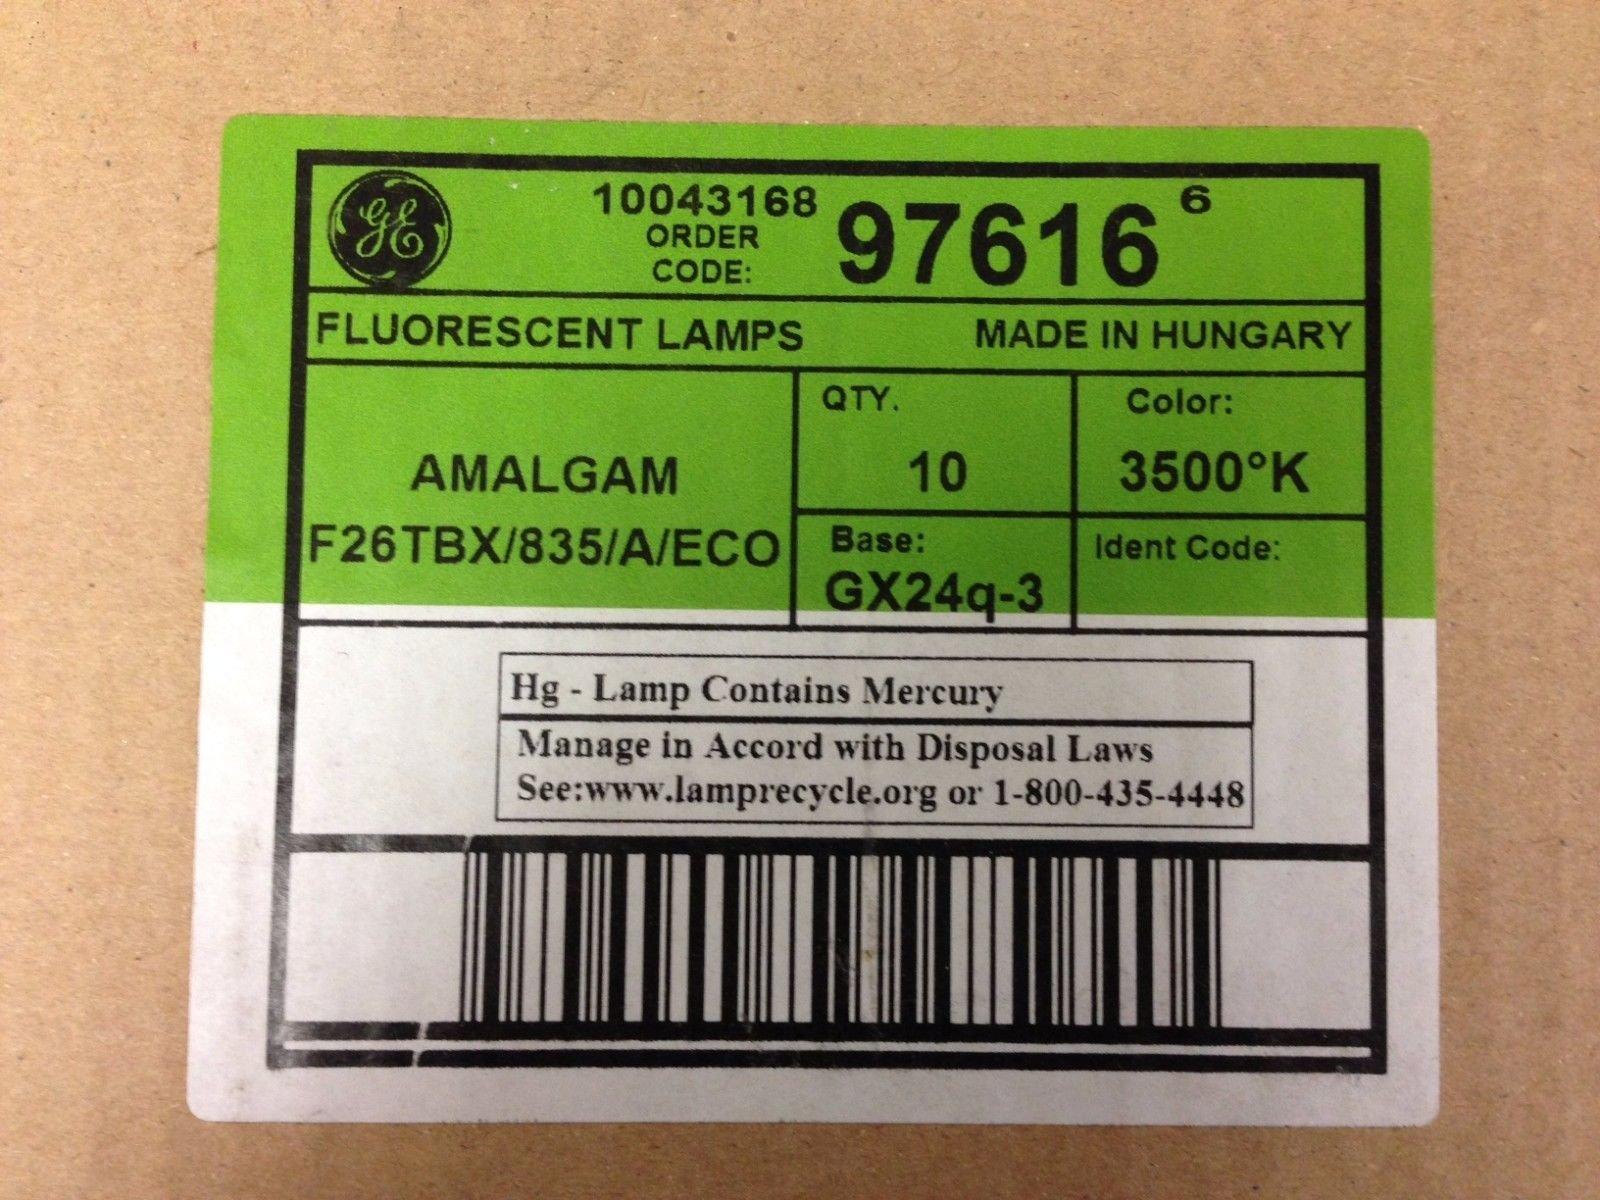 20 Ge 97616 F26TBX/835/A/Eco Amalgam Biax 26 W 4 Pin GX24Q-3 Base 3500K Bulbs